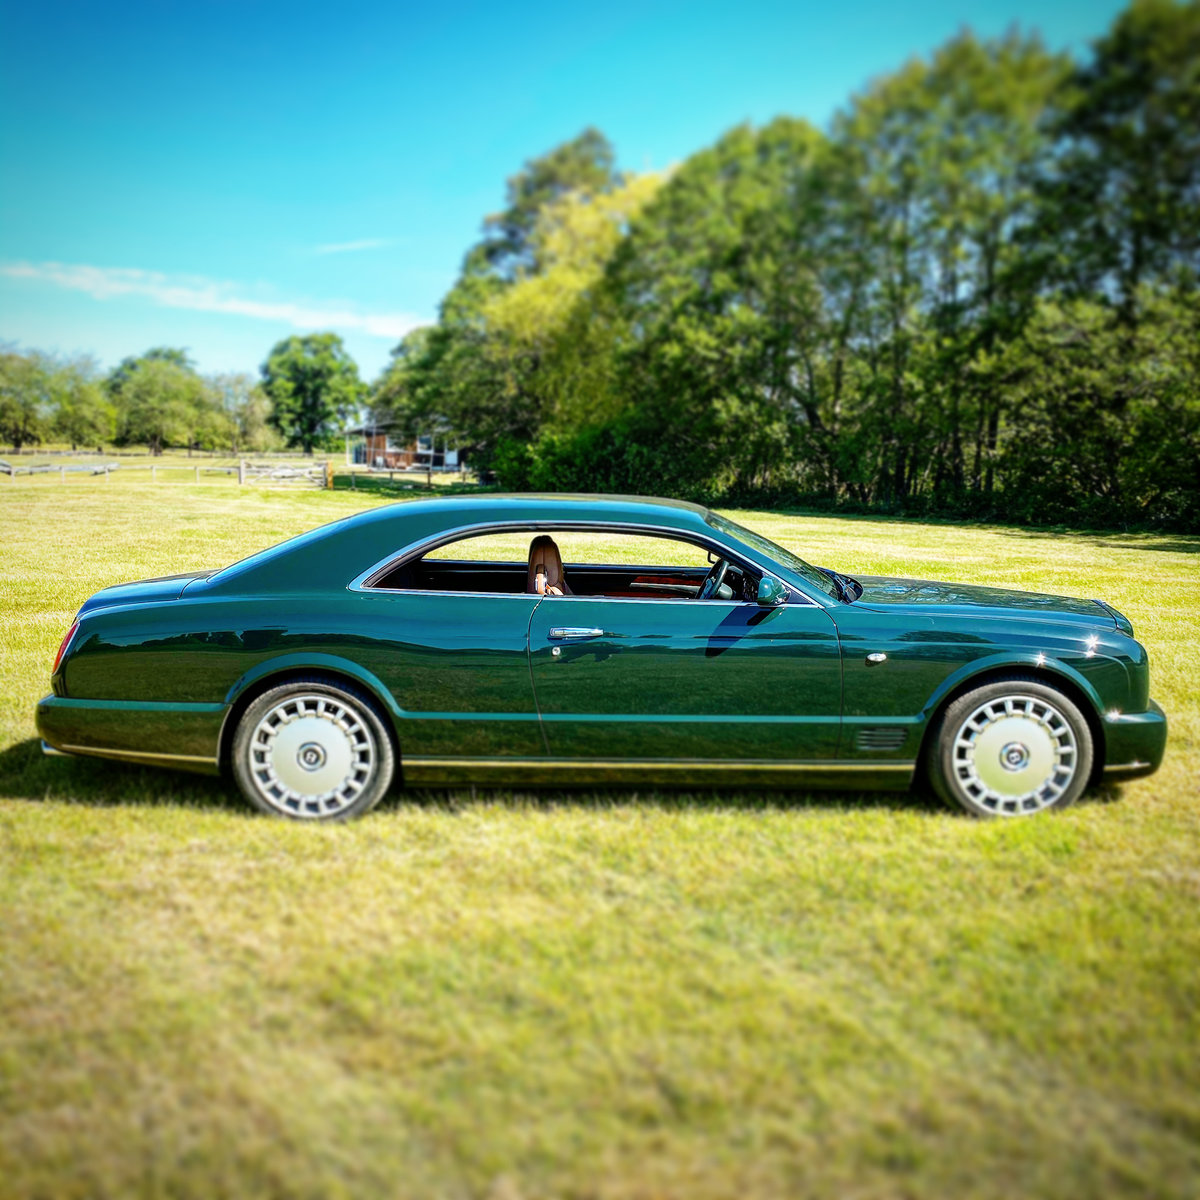 2008 Bentley Brooklands For Sale (picture 1 of 6)